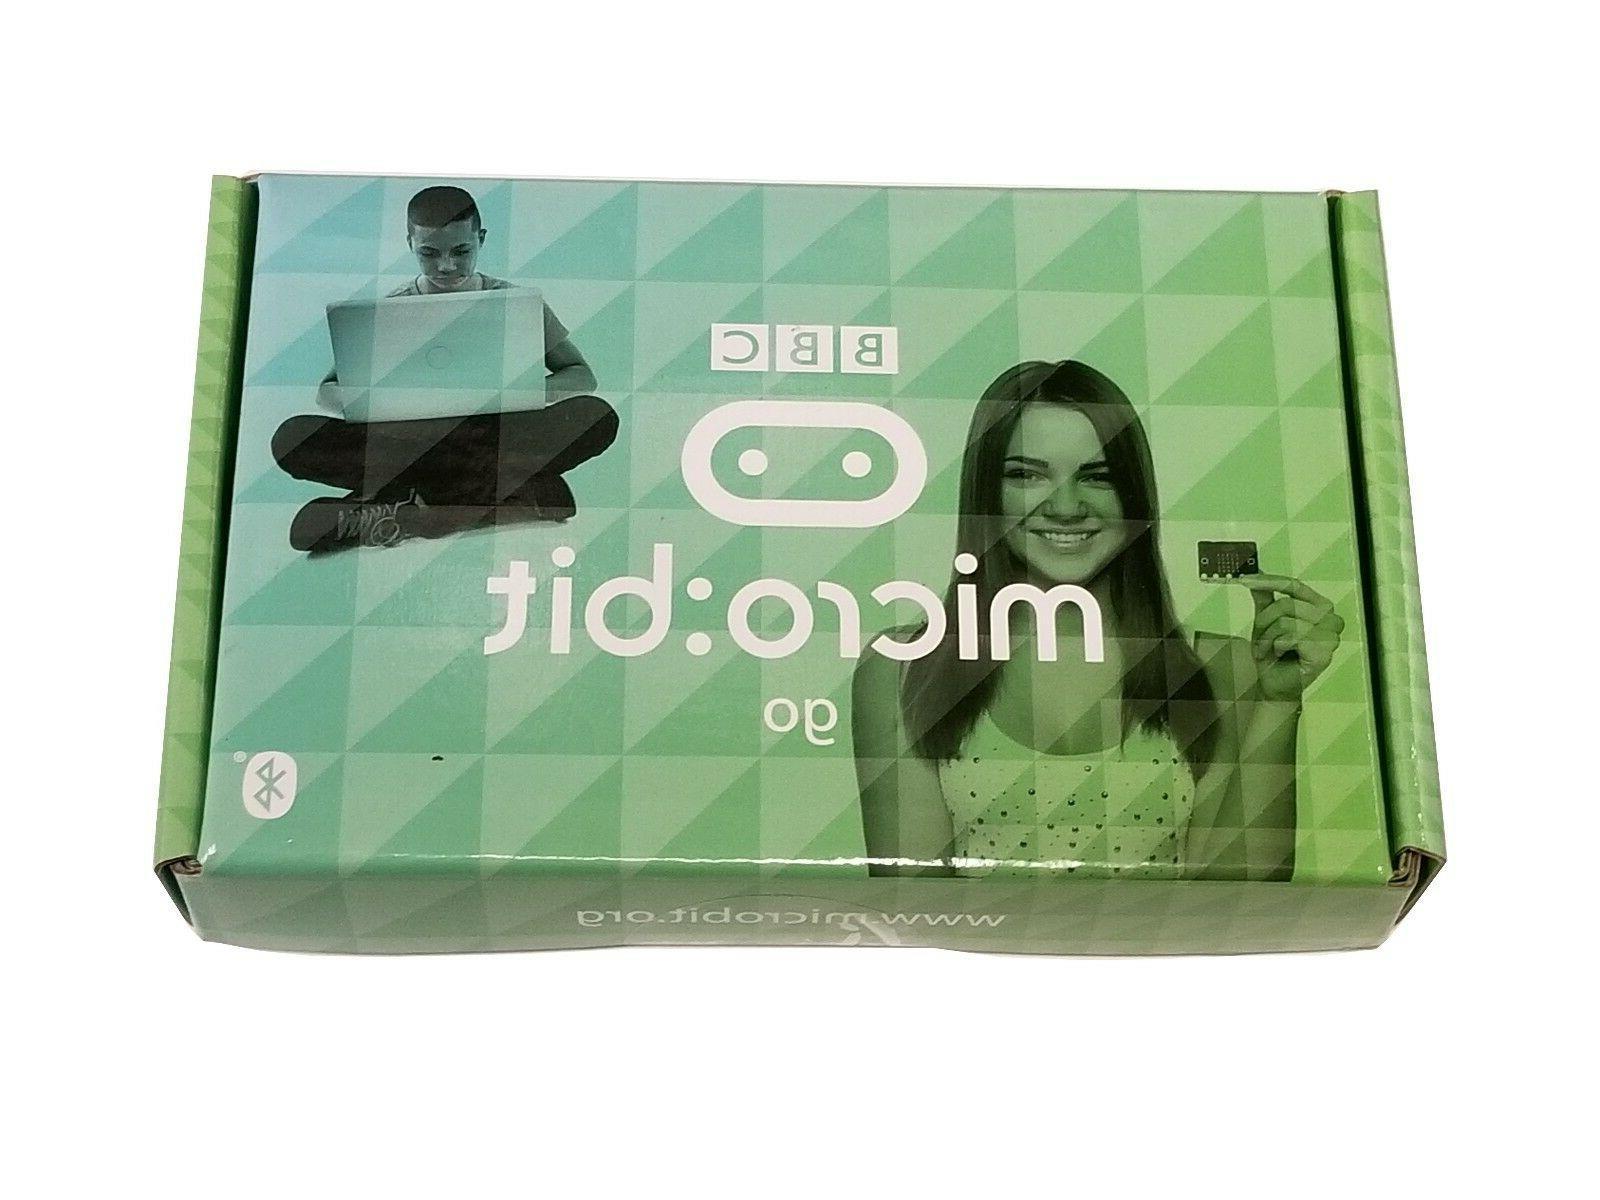 bbc micro bit go pocket sized computer